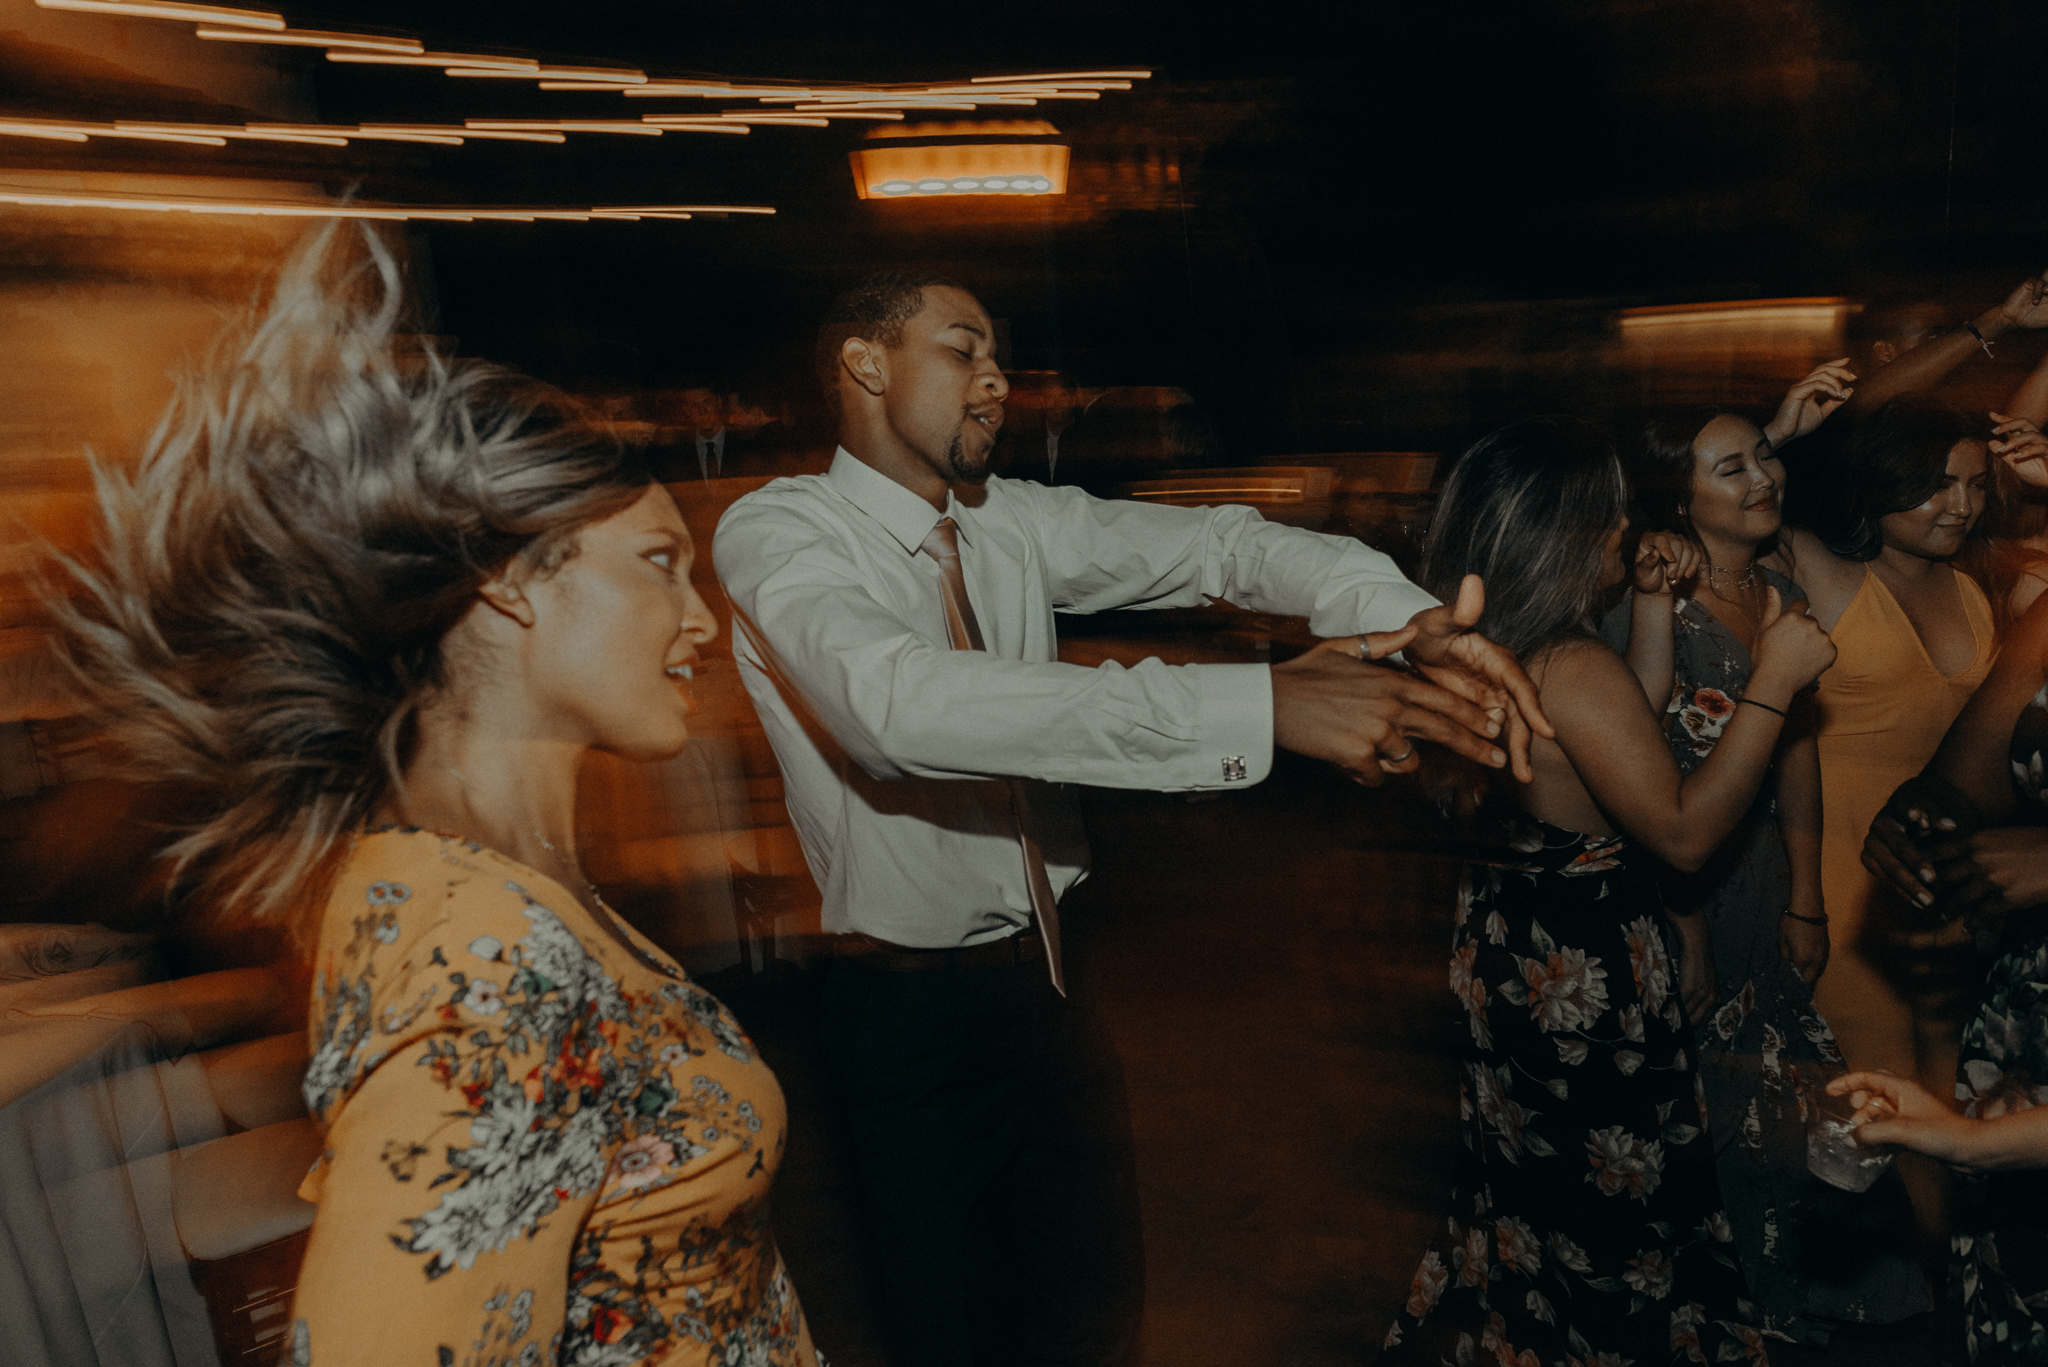 Isaiah + Taylor Photography - Rancho Las Lomas Wedding, Los Angeles Wedding Photographer-158.jpg